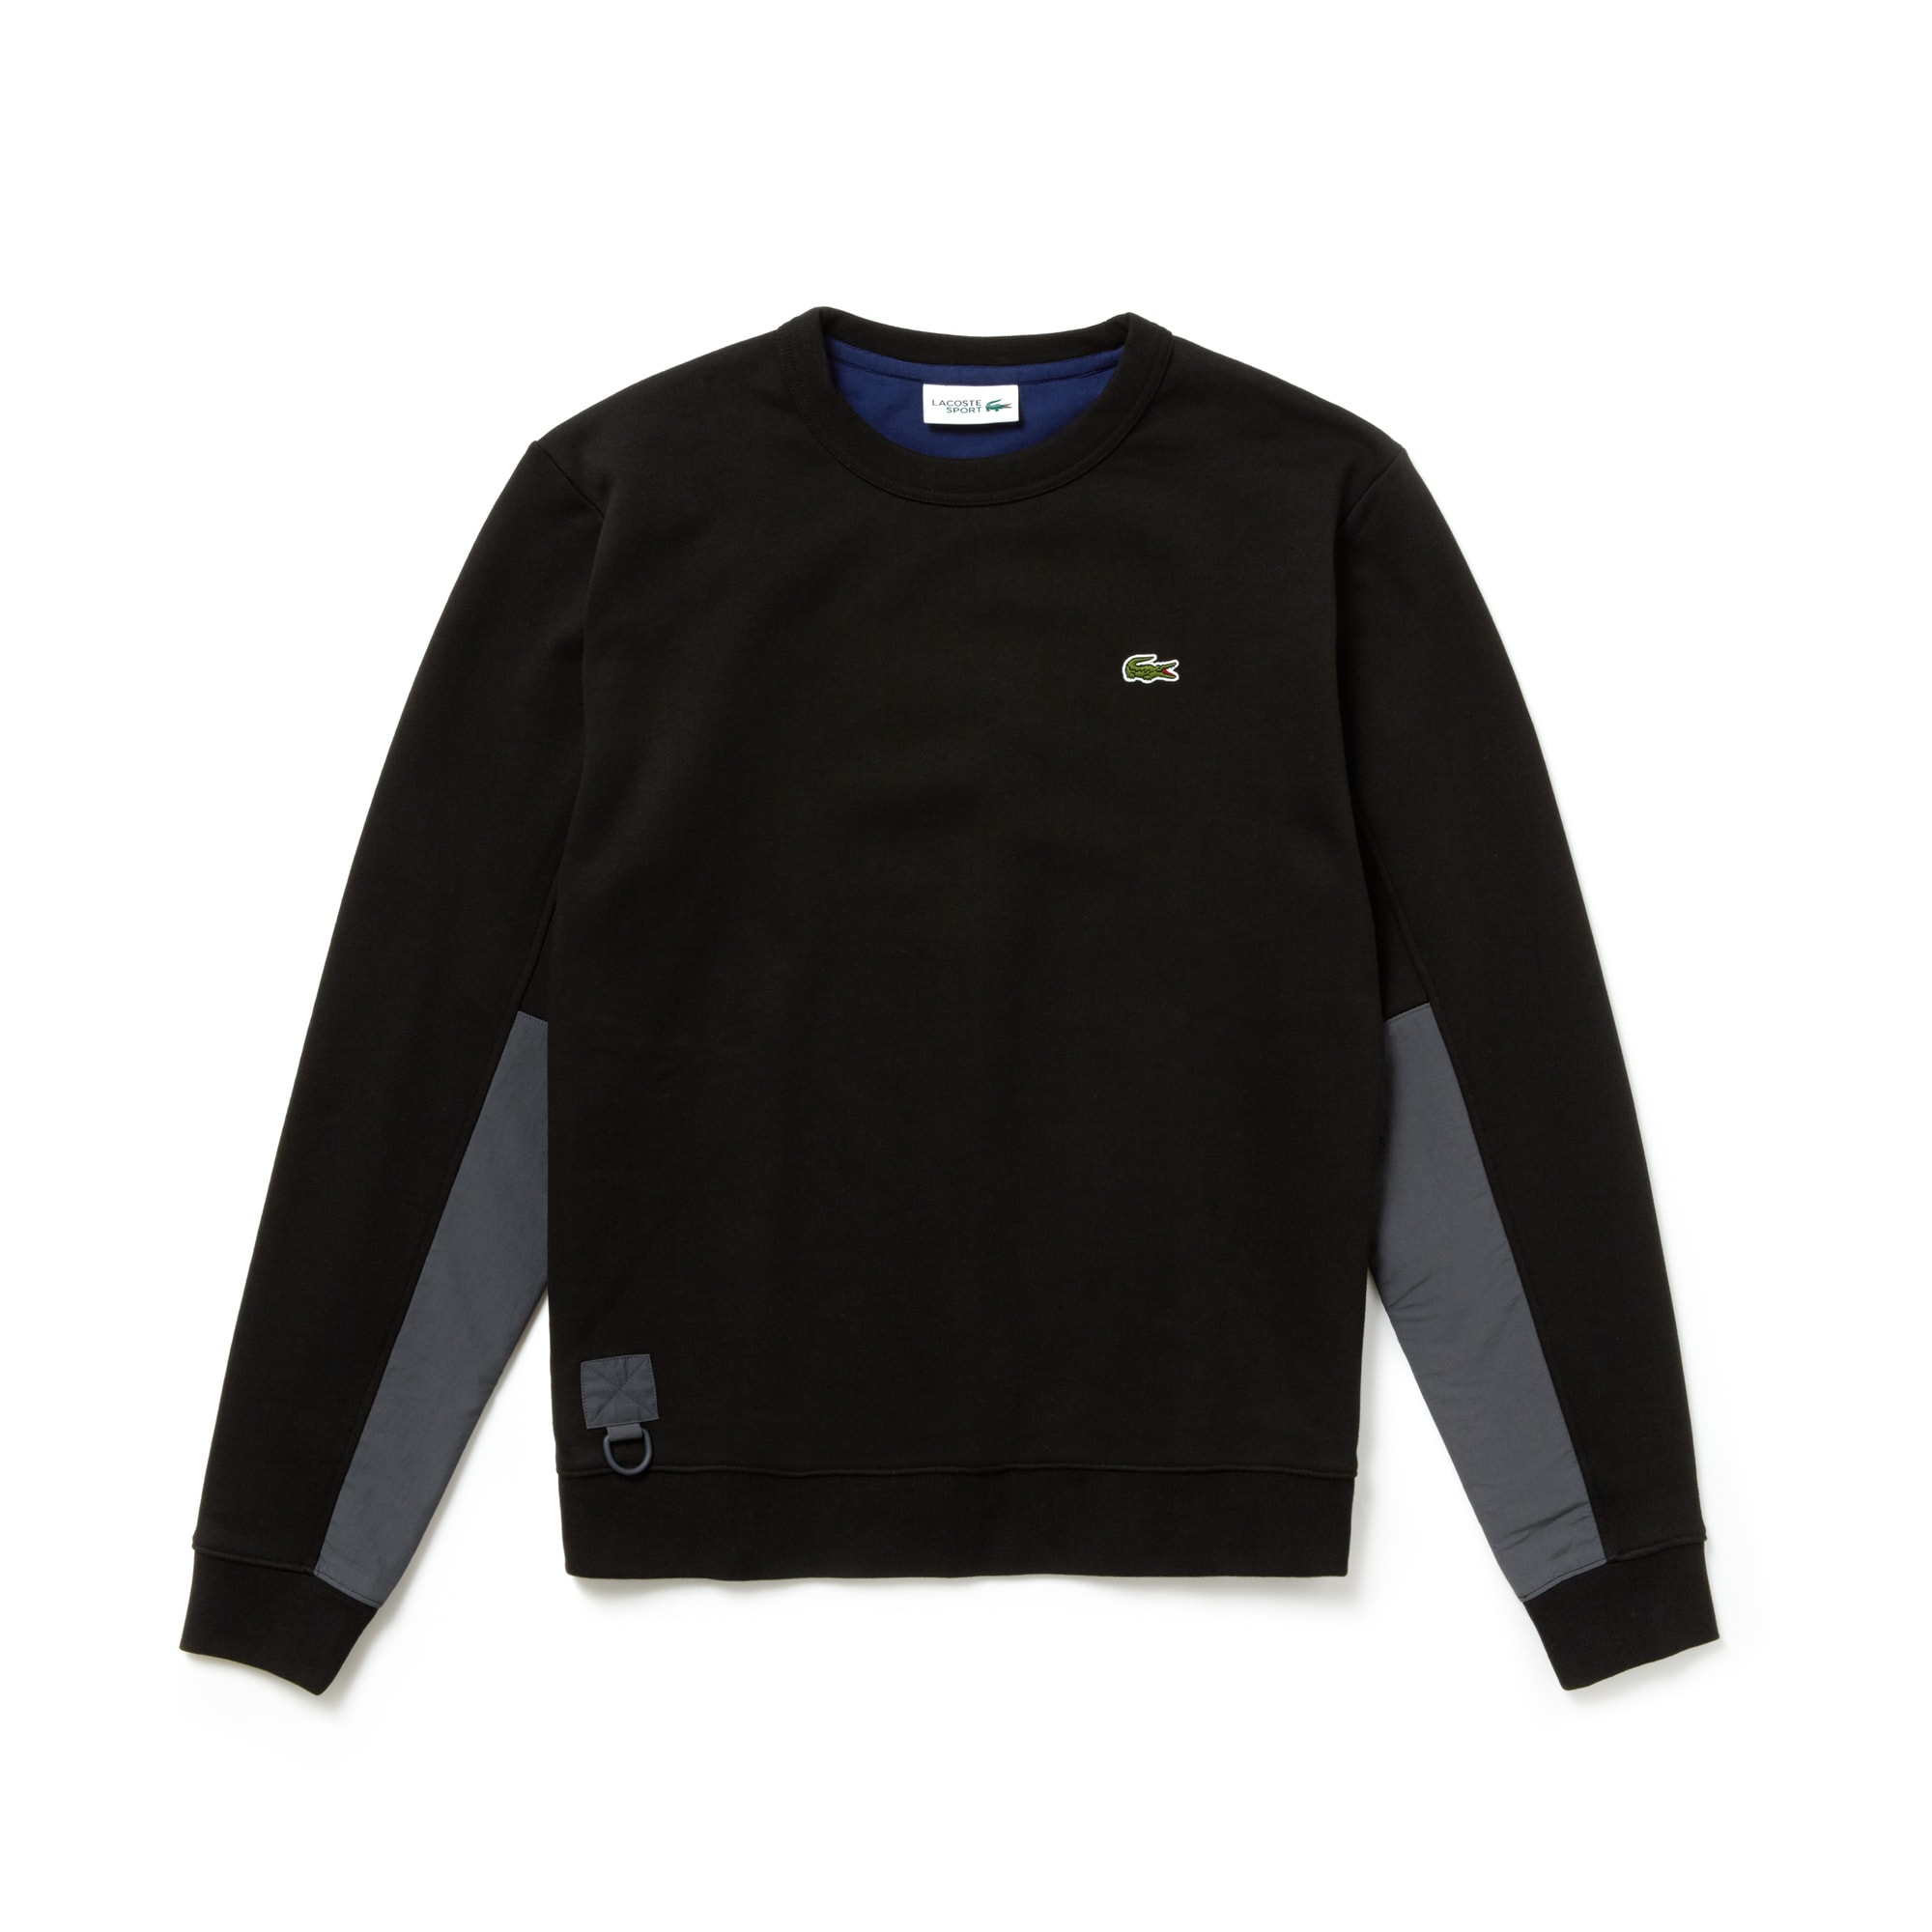 a97f7ec727 Sweaters   Sweatshirts